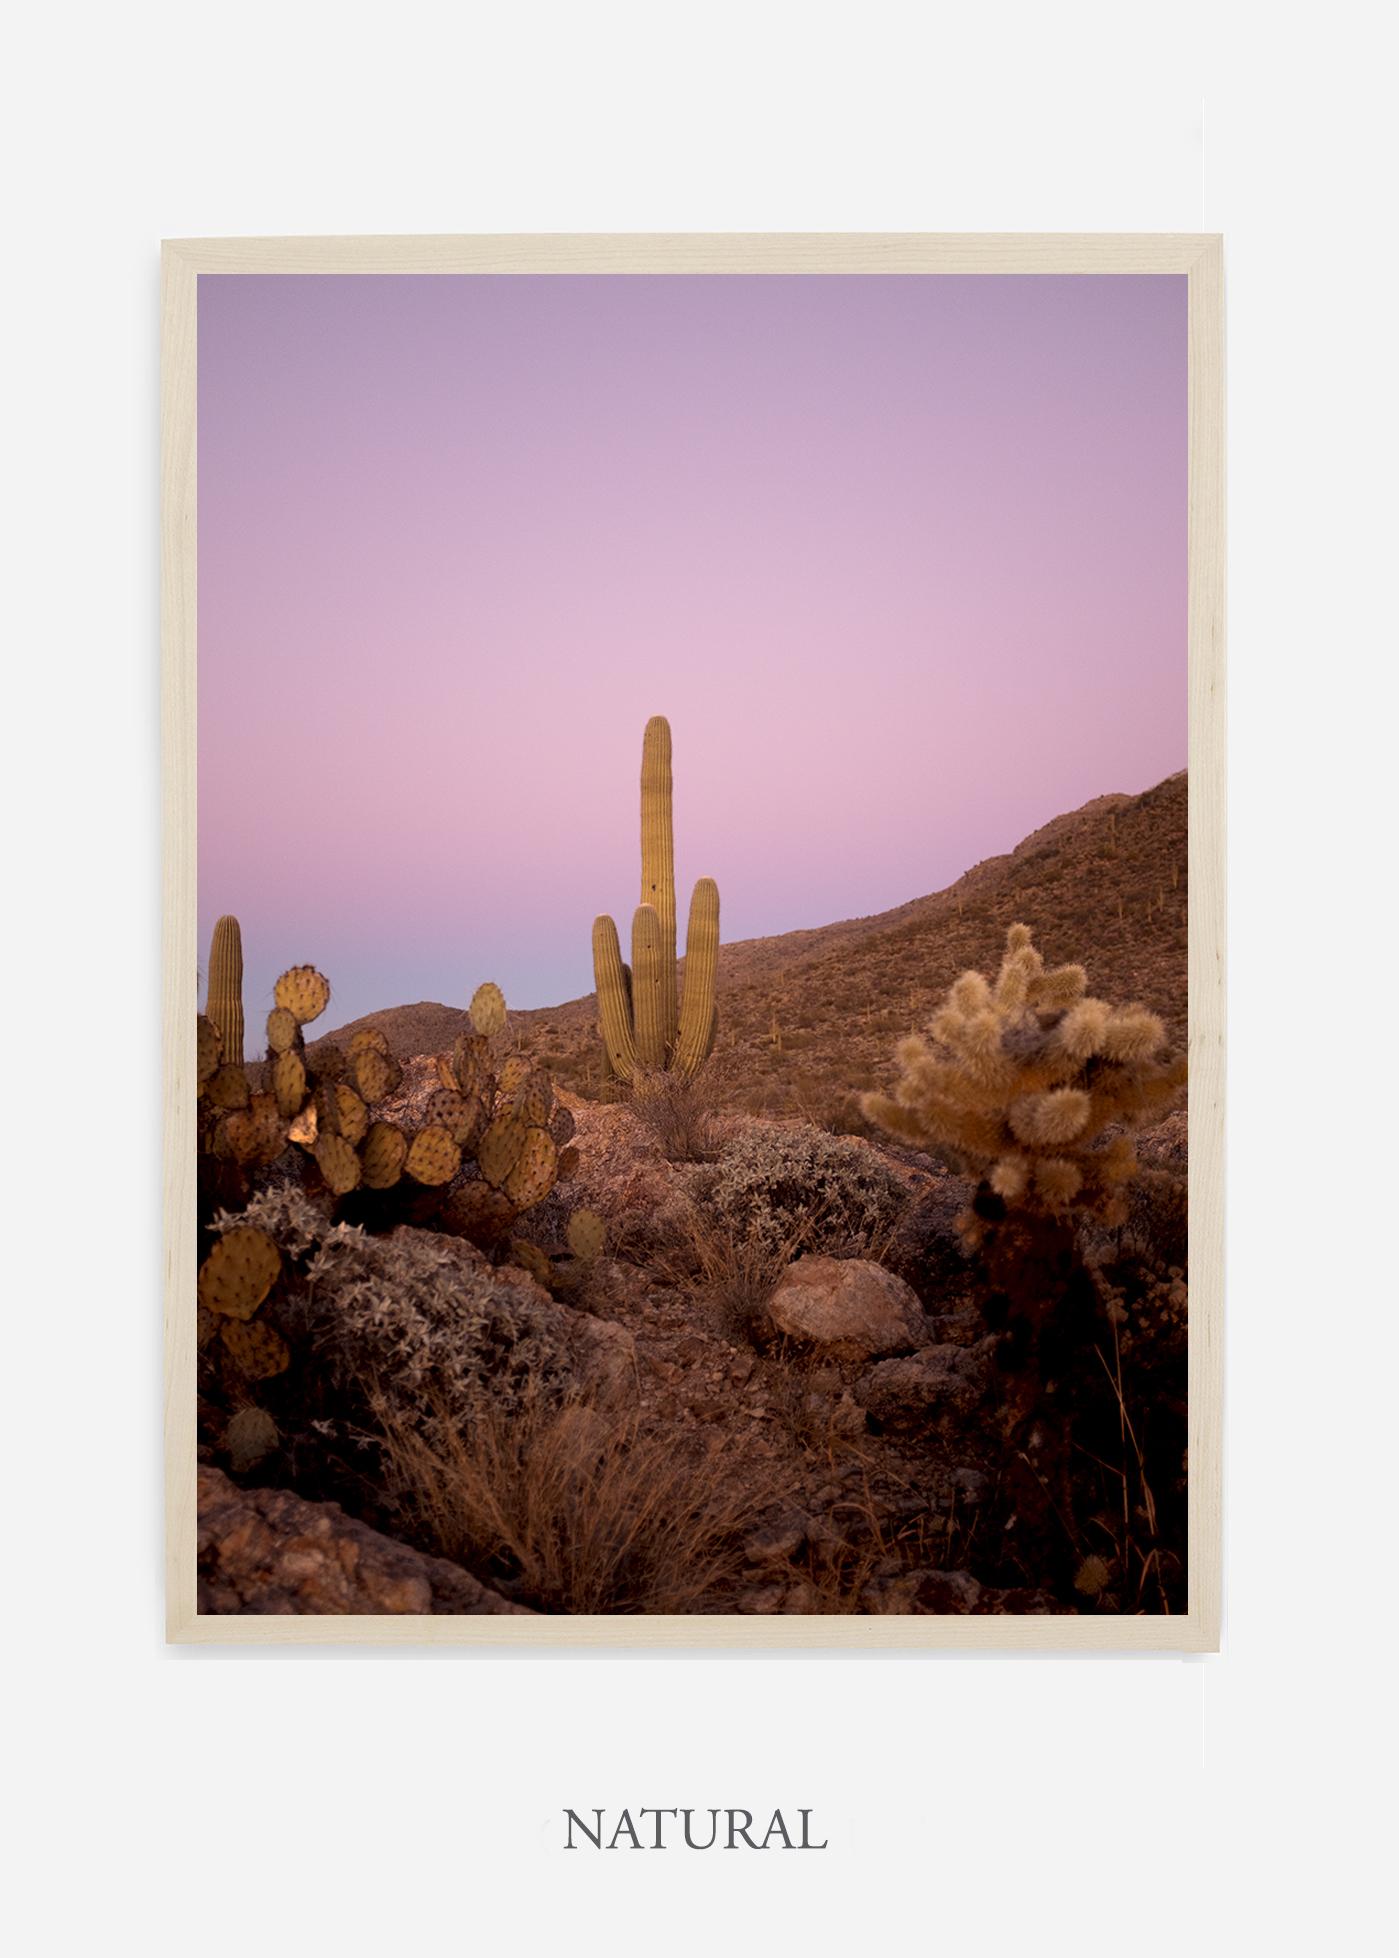 nomat-naturalframe-saguaroNo.10-wildercalifornia-art-wallart-cactusprint-homedecor-prints-arizona-botanical-artwork-interiordesign.jpg